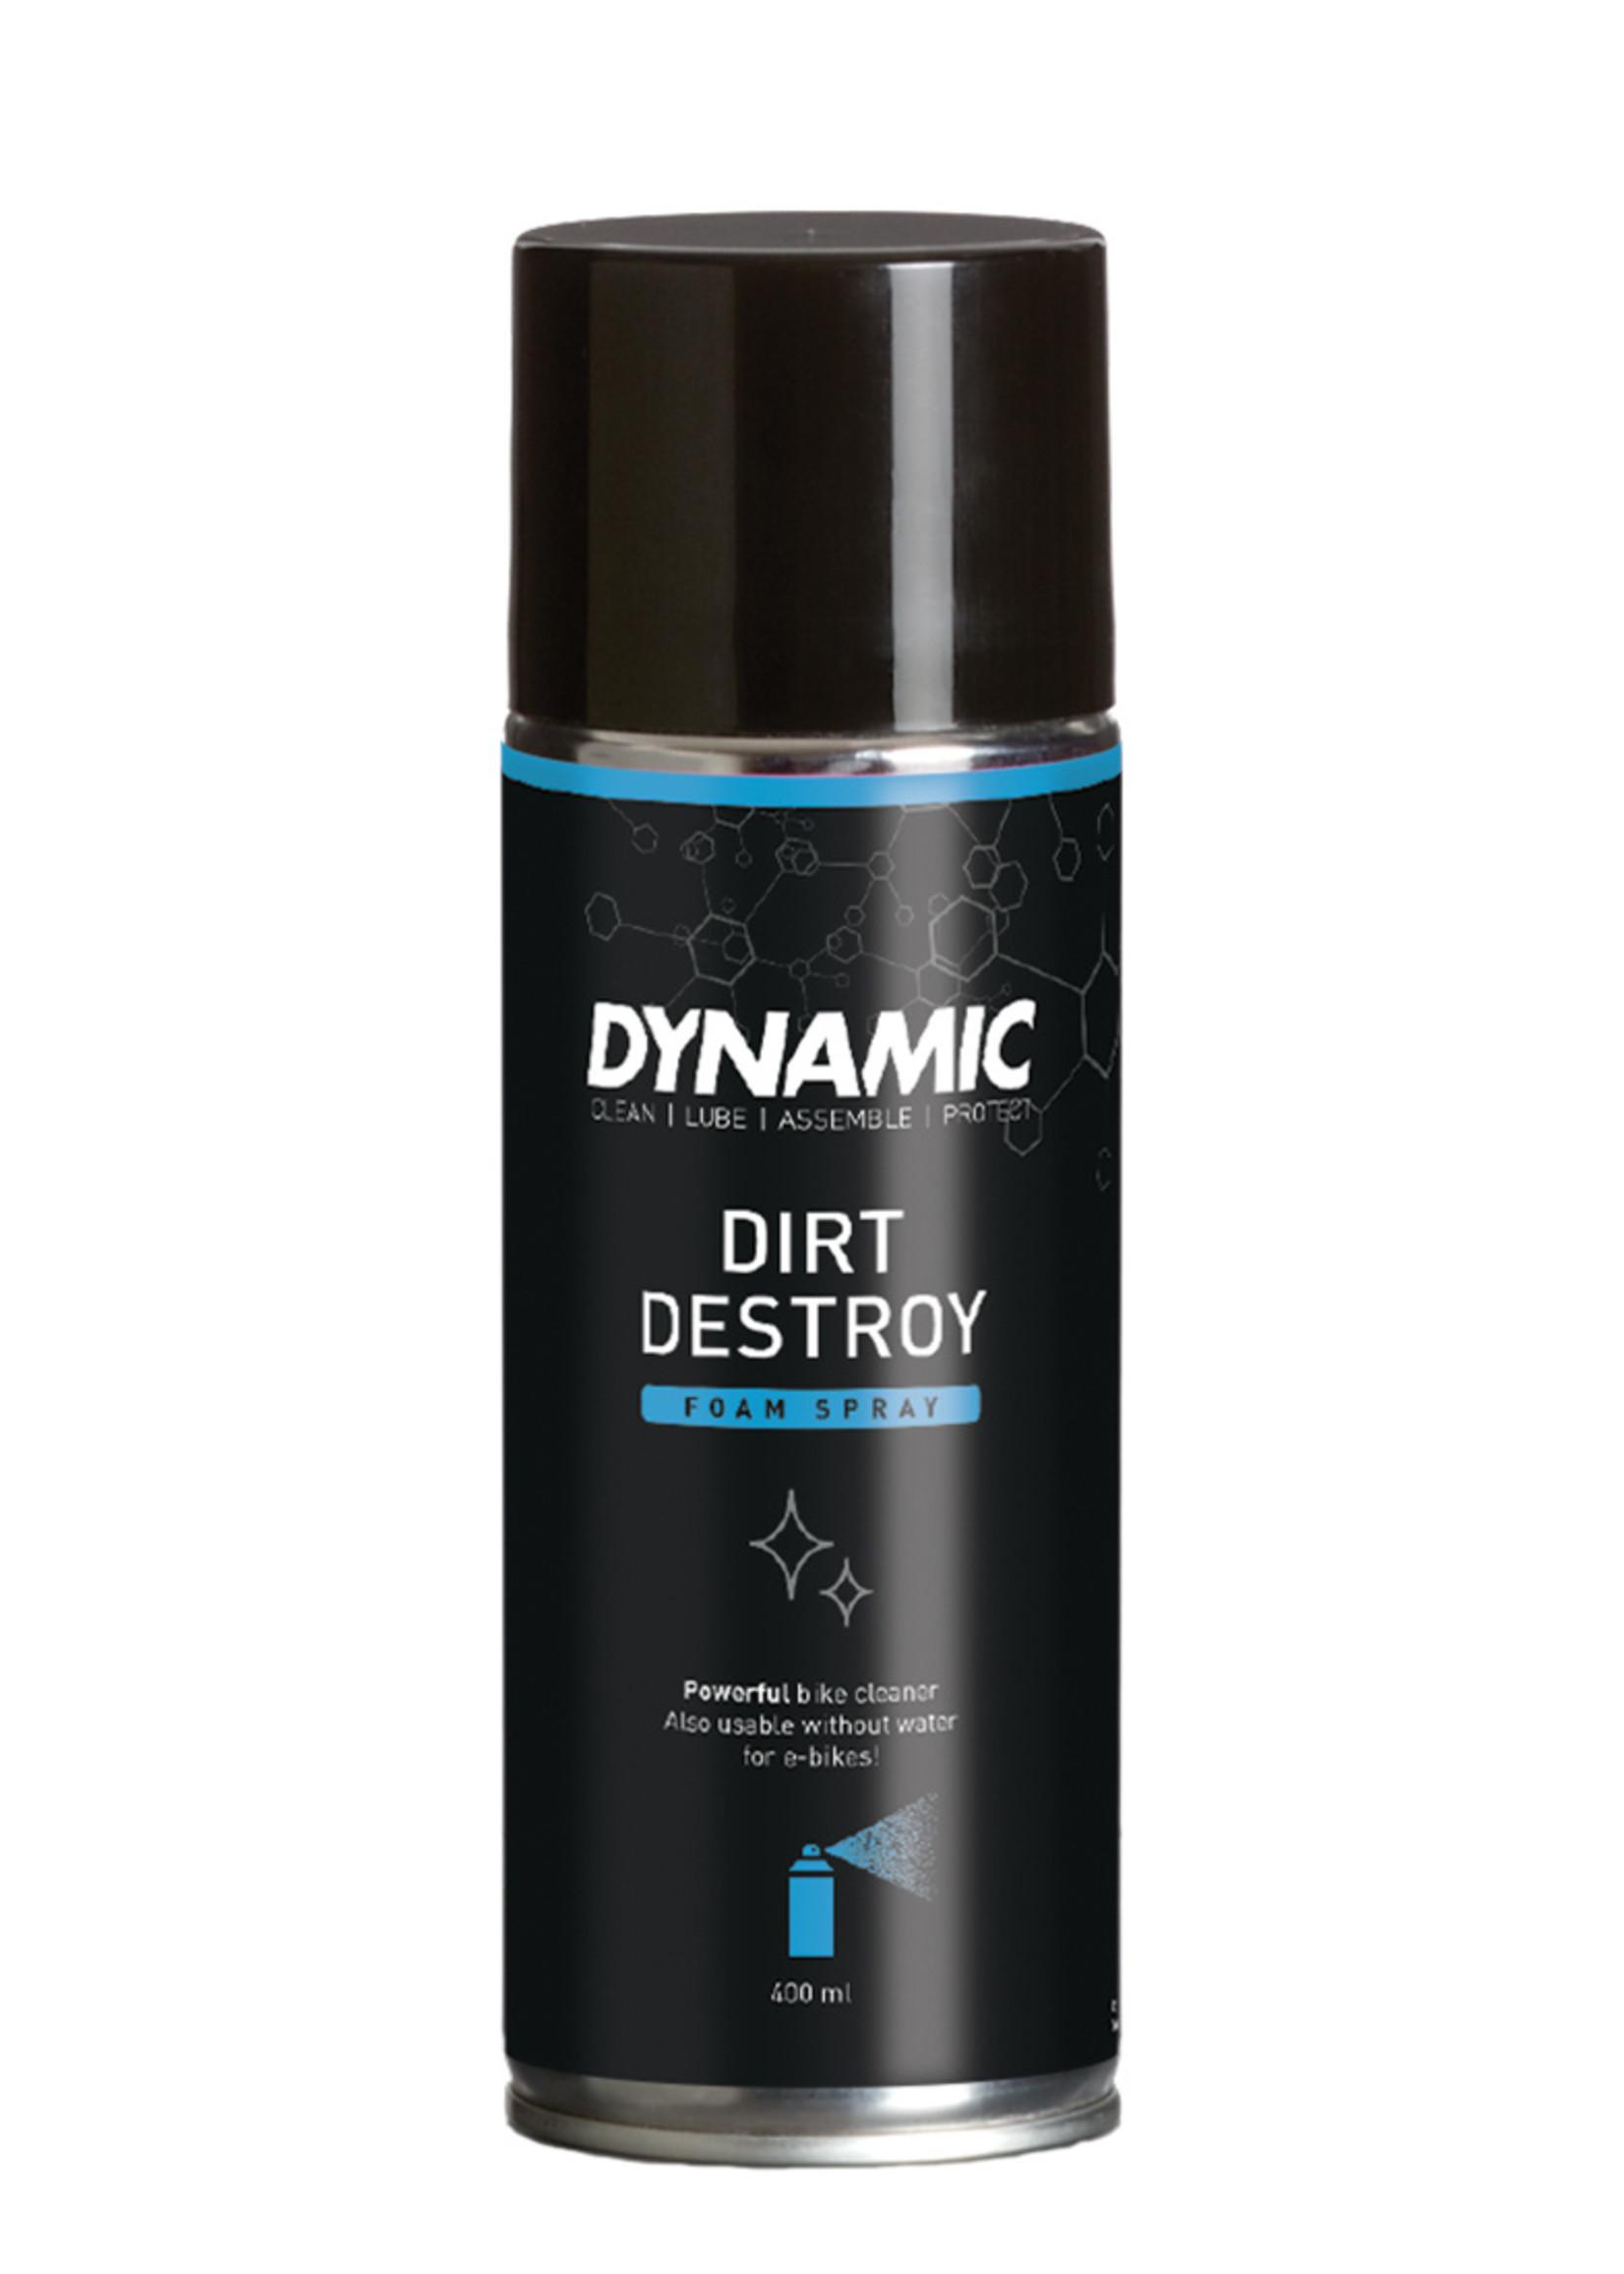 Dirt Destroy Spray 400 ml Spray Can